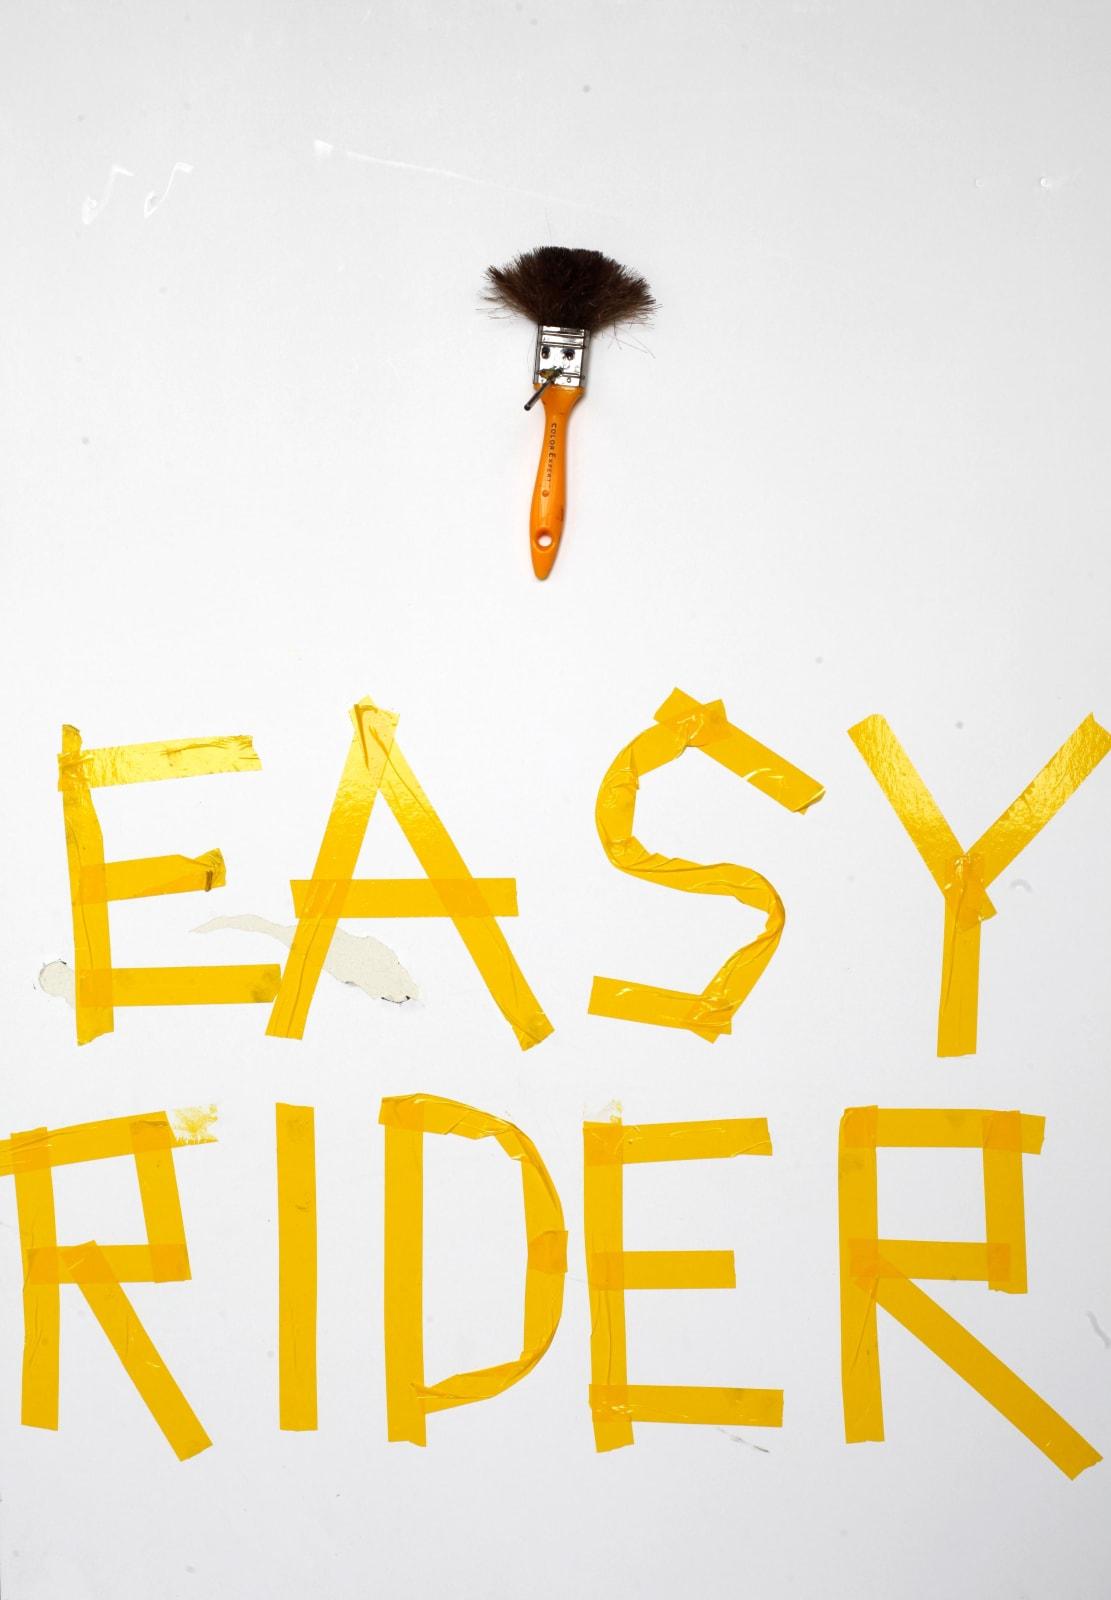 Kristof Kintera, Easy Rider, 2017, mixed media, cm 103 x 73